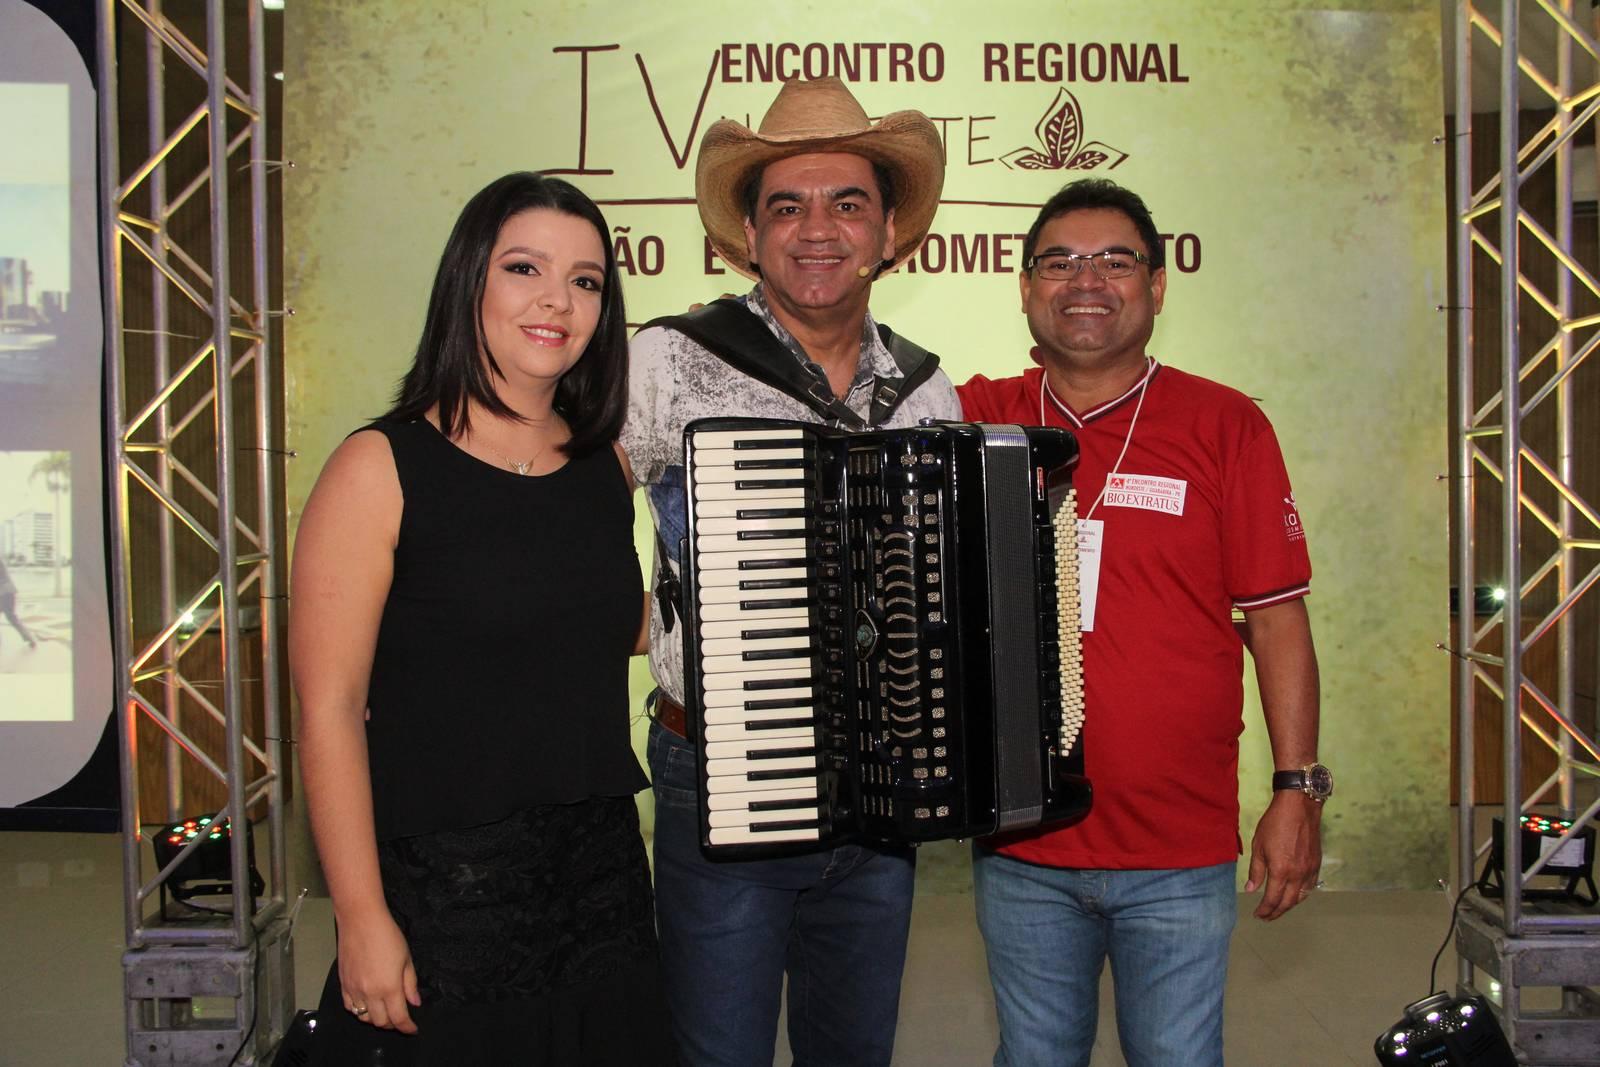 IV Encontro Regional do Nordeste - Bio Extratus (106)